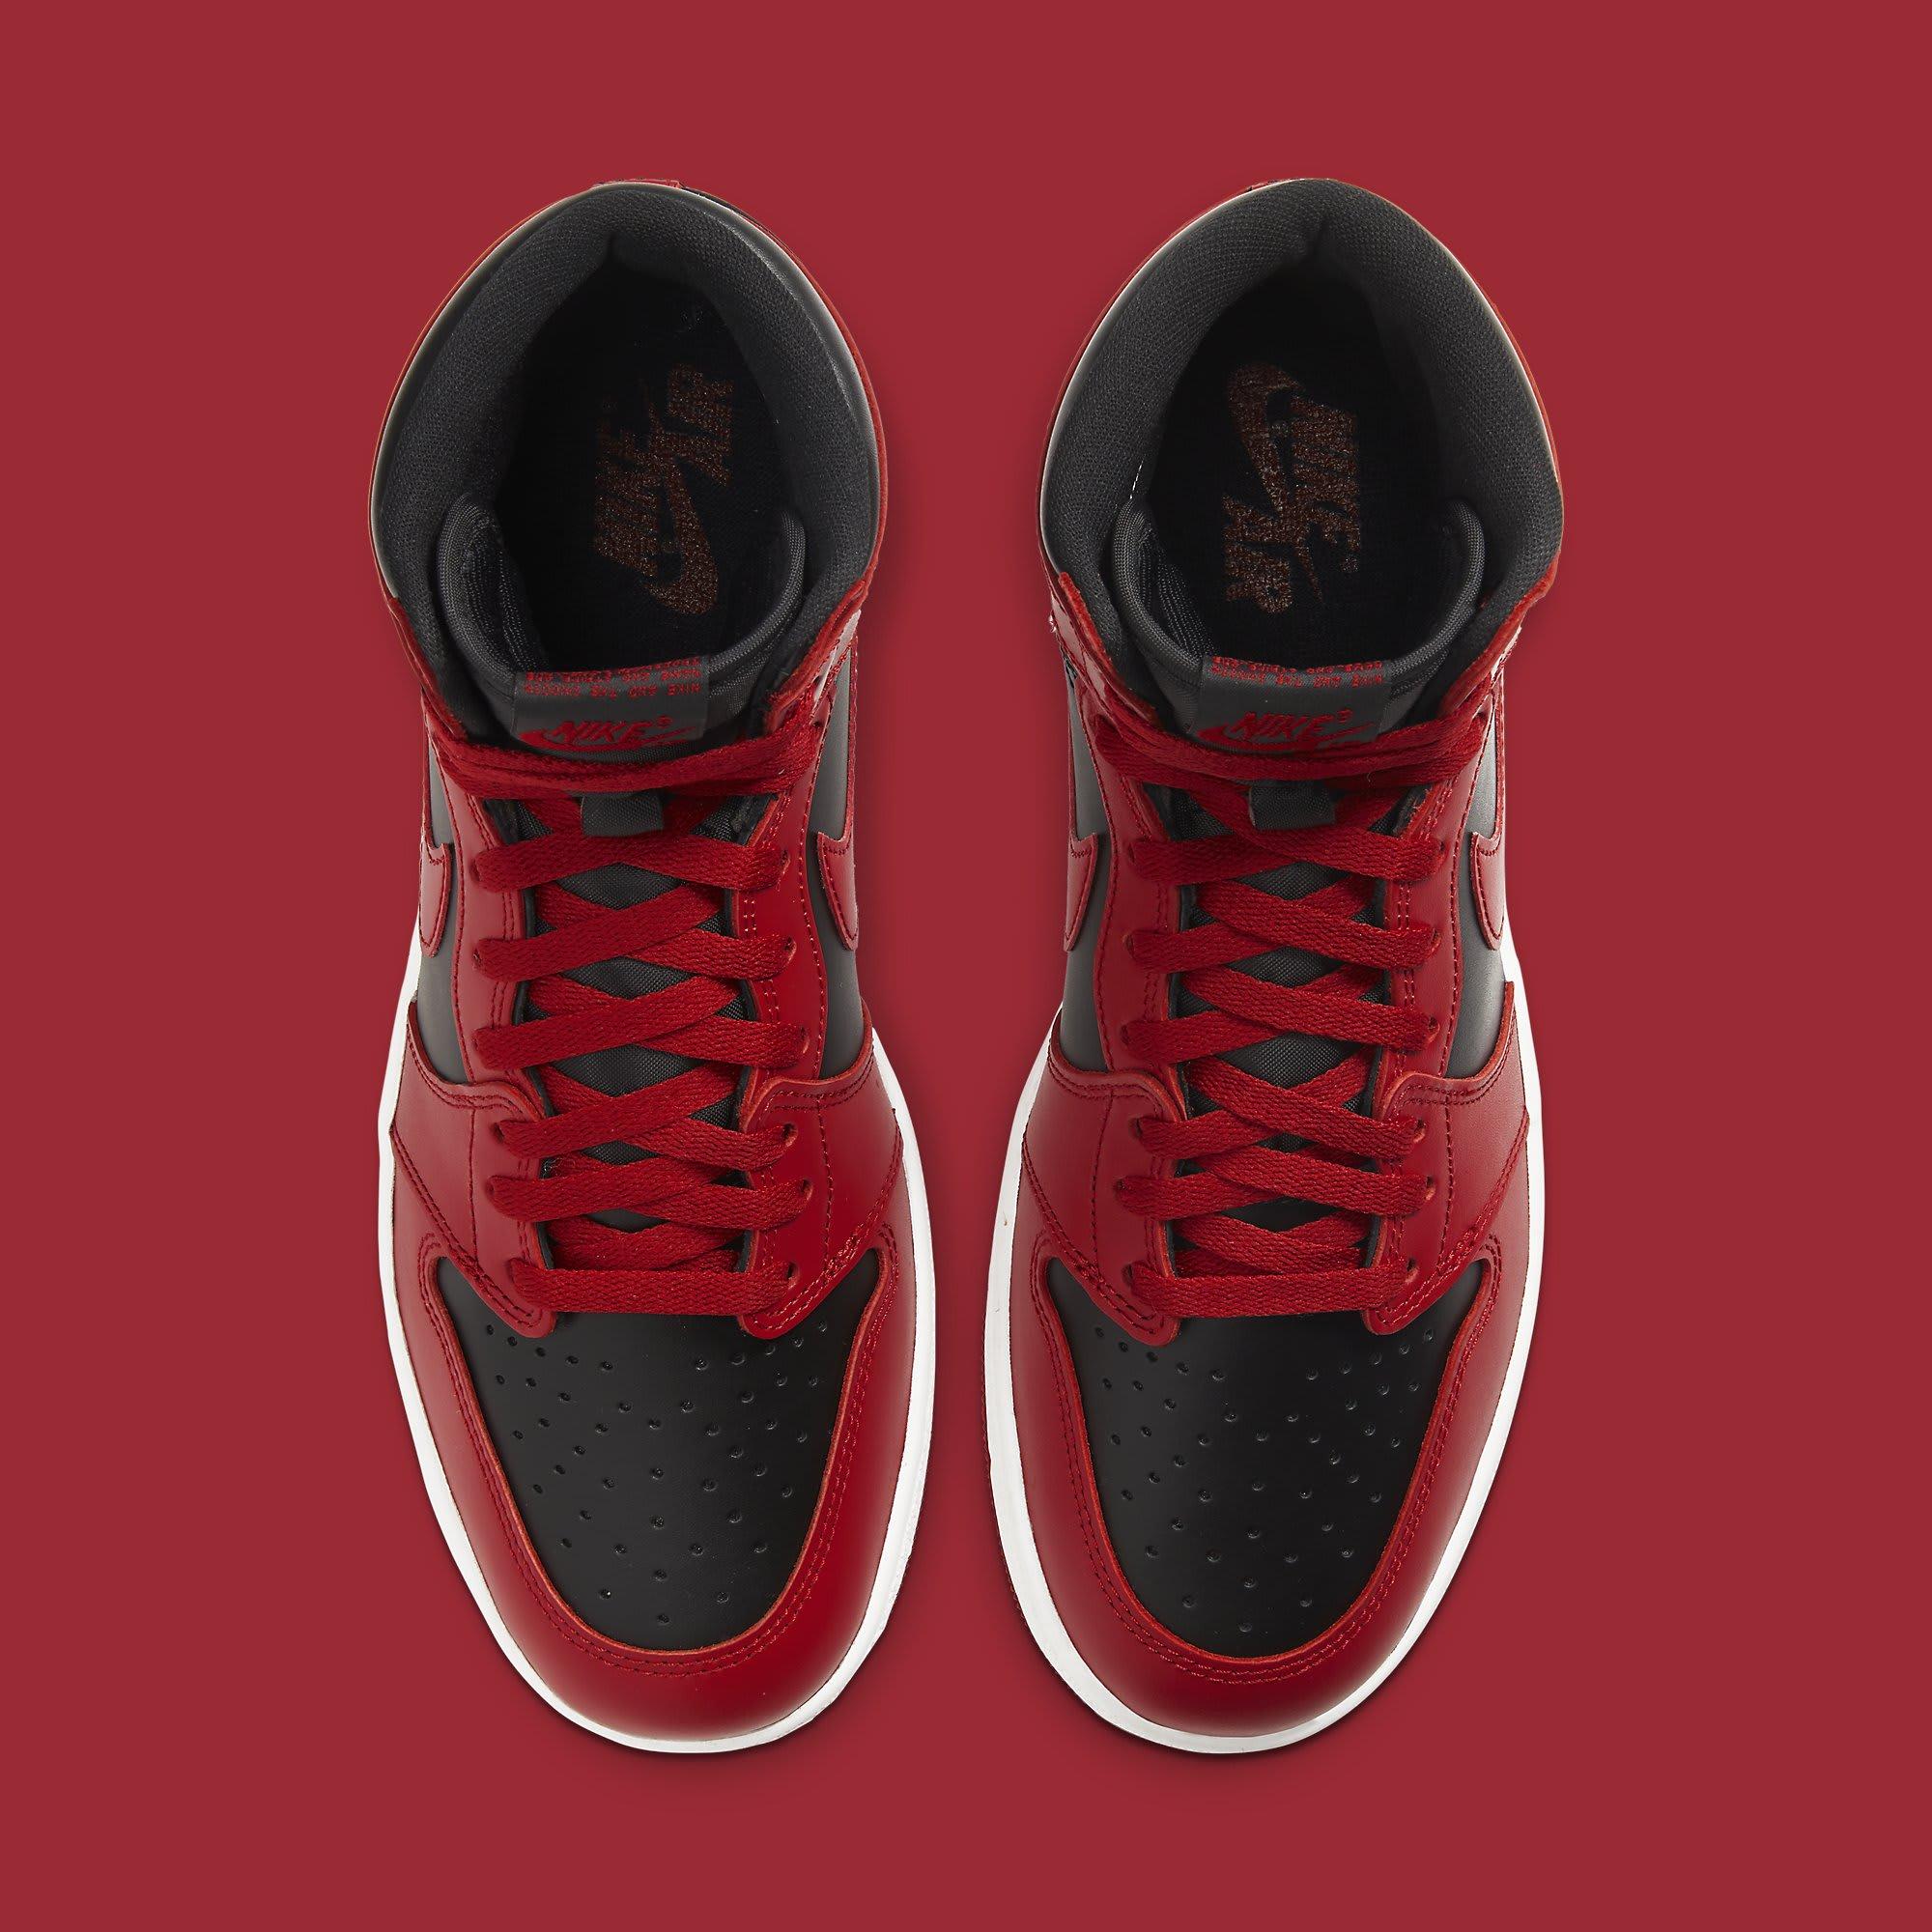 Air Jordan 1 High New Beginnings Varsity Red Release Date BQ4422-600 Top